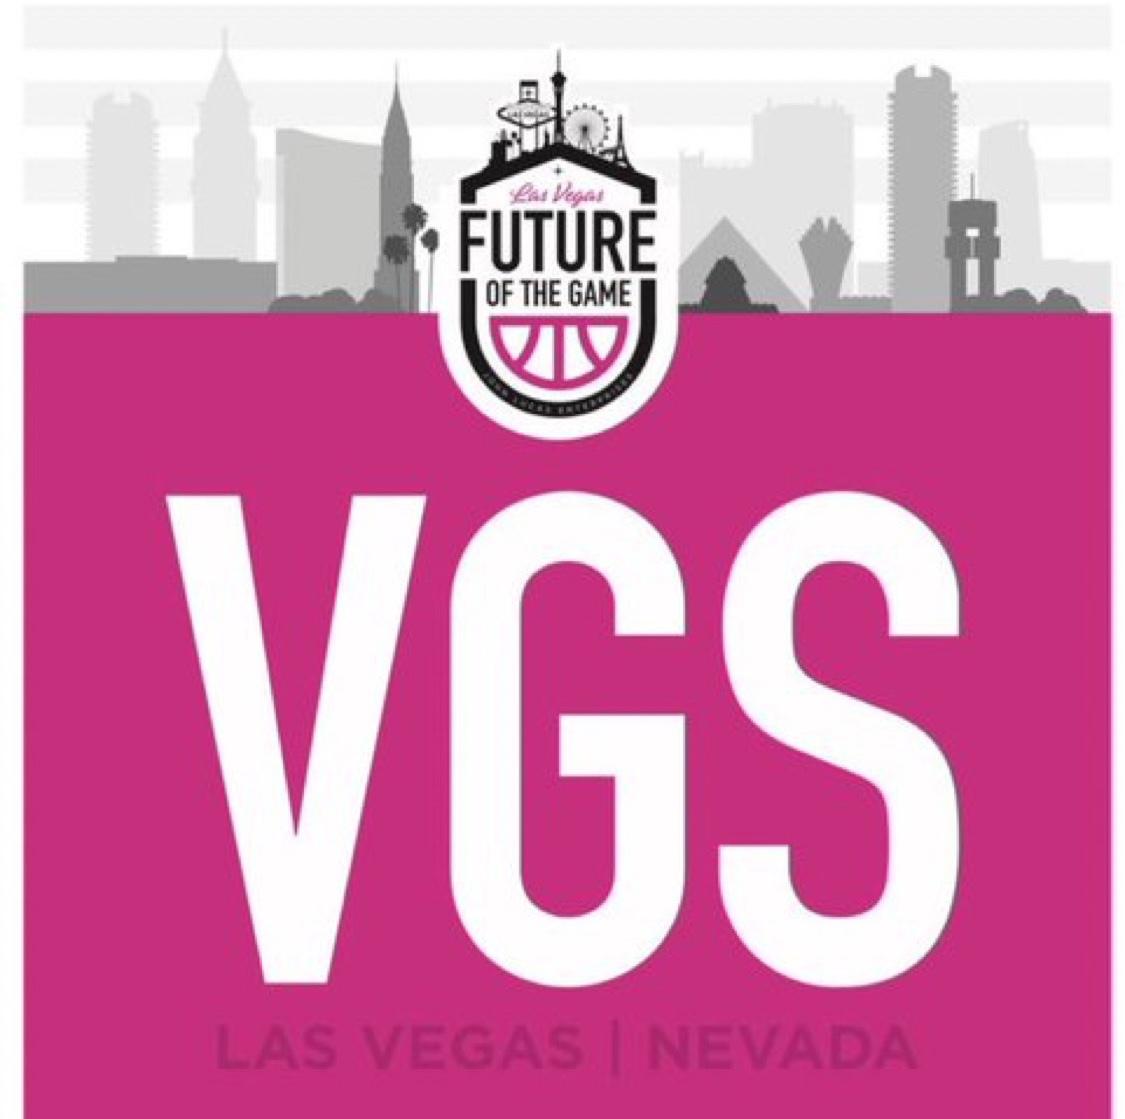 2019 John Lucas Future of the Game-Las Vegas -